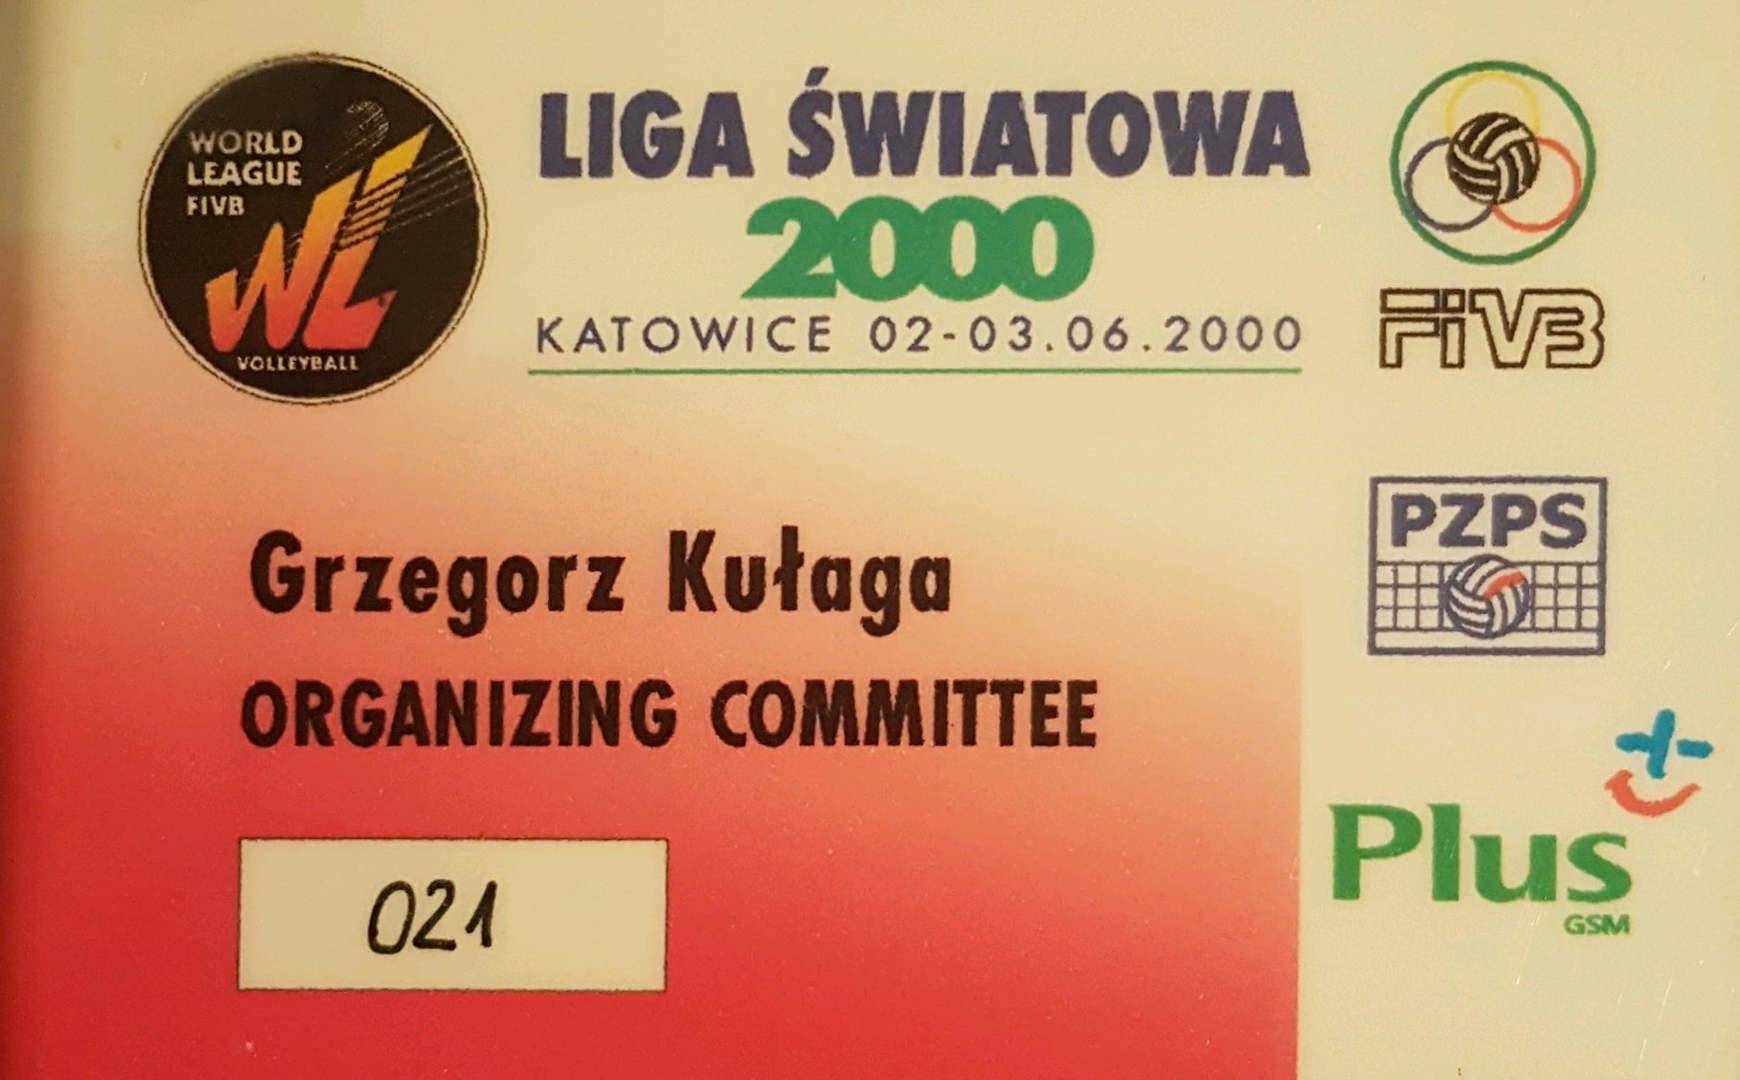 2000_Liga_Światowa.jpg